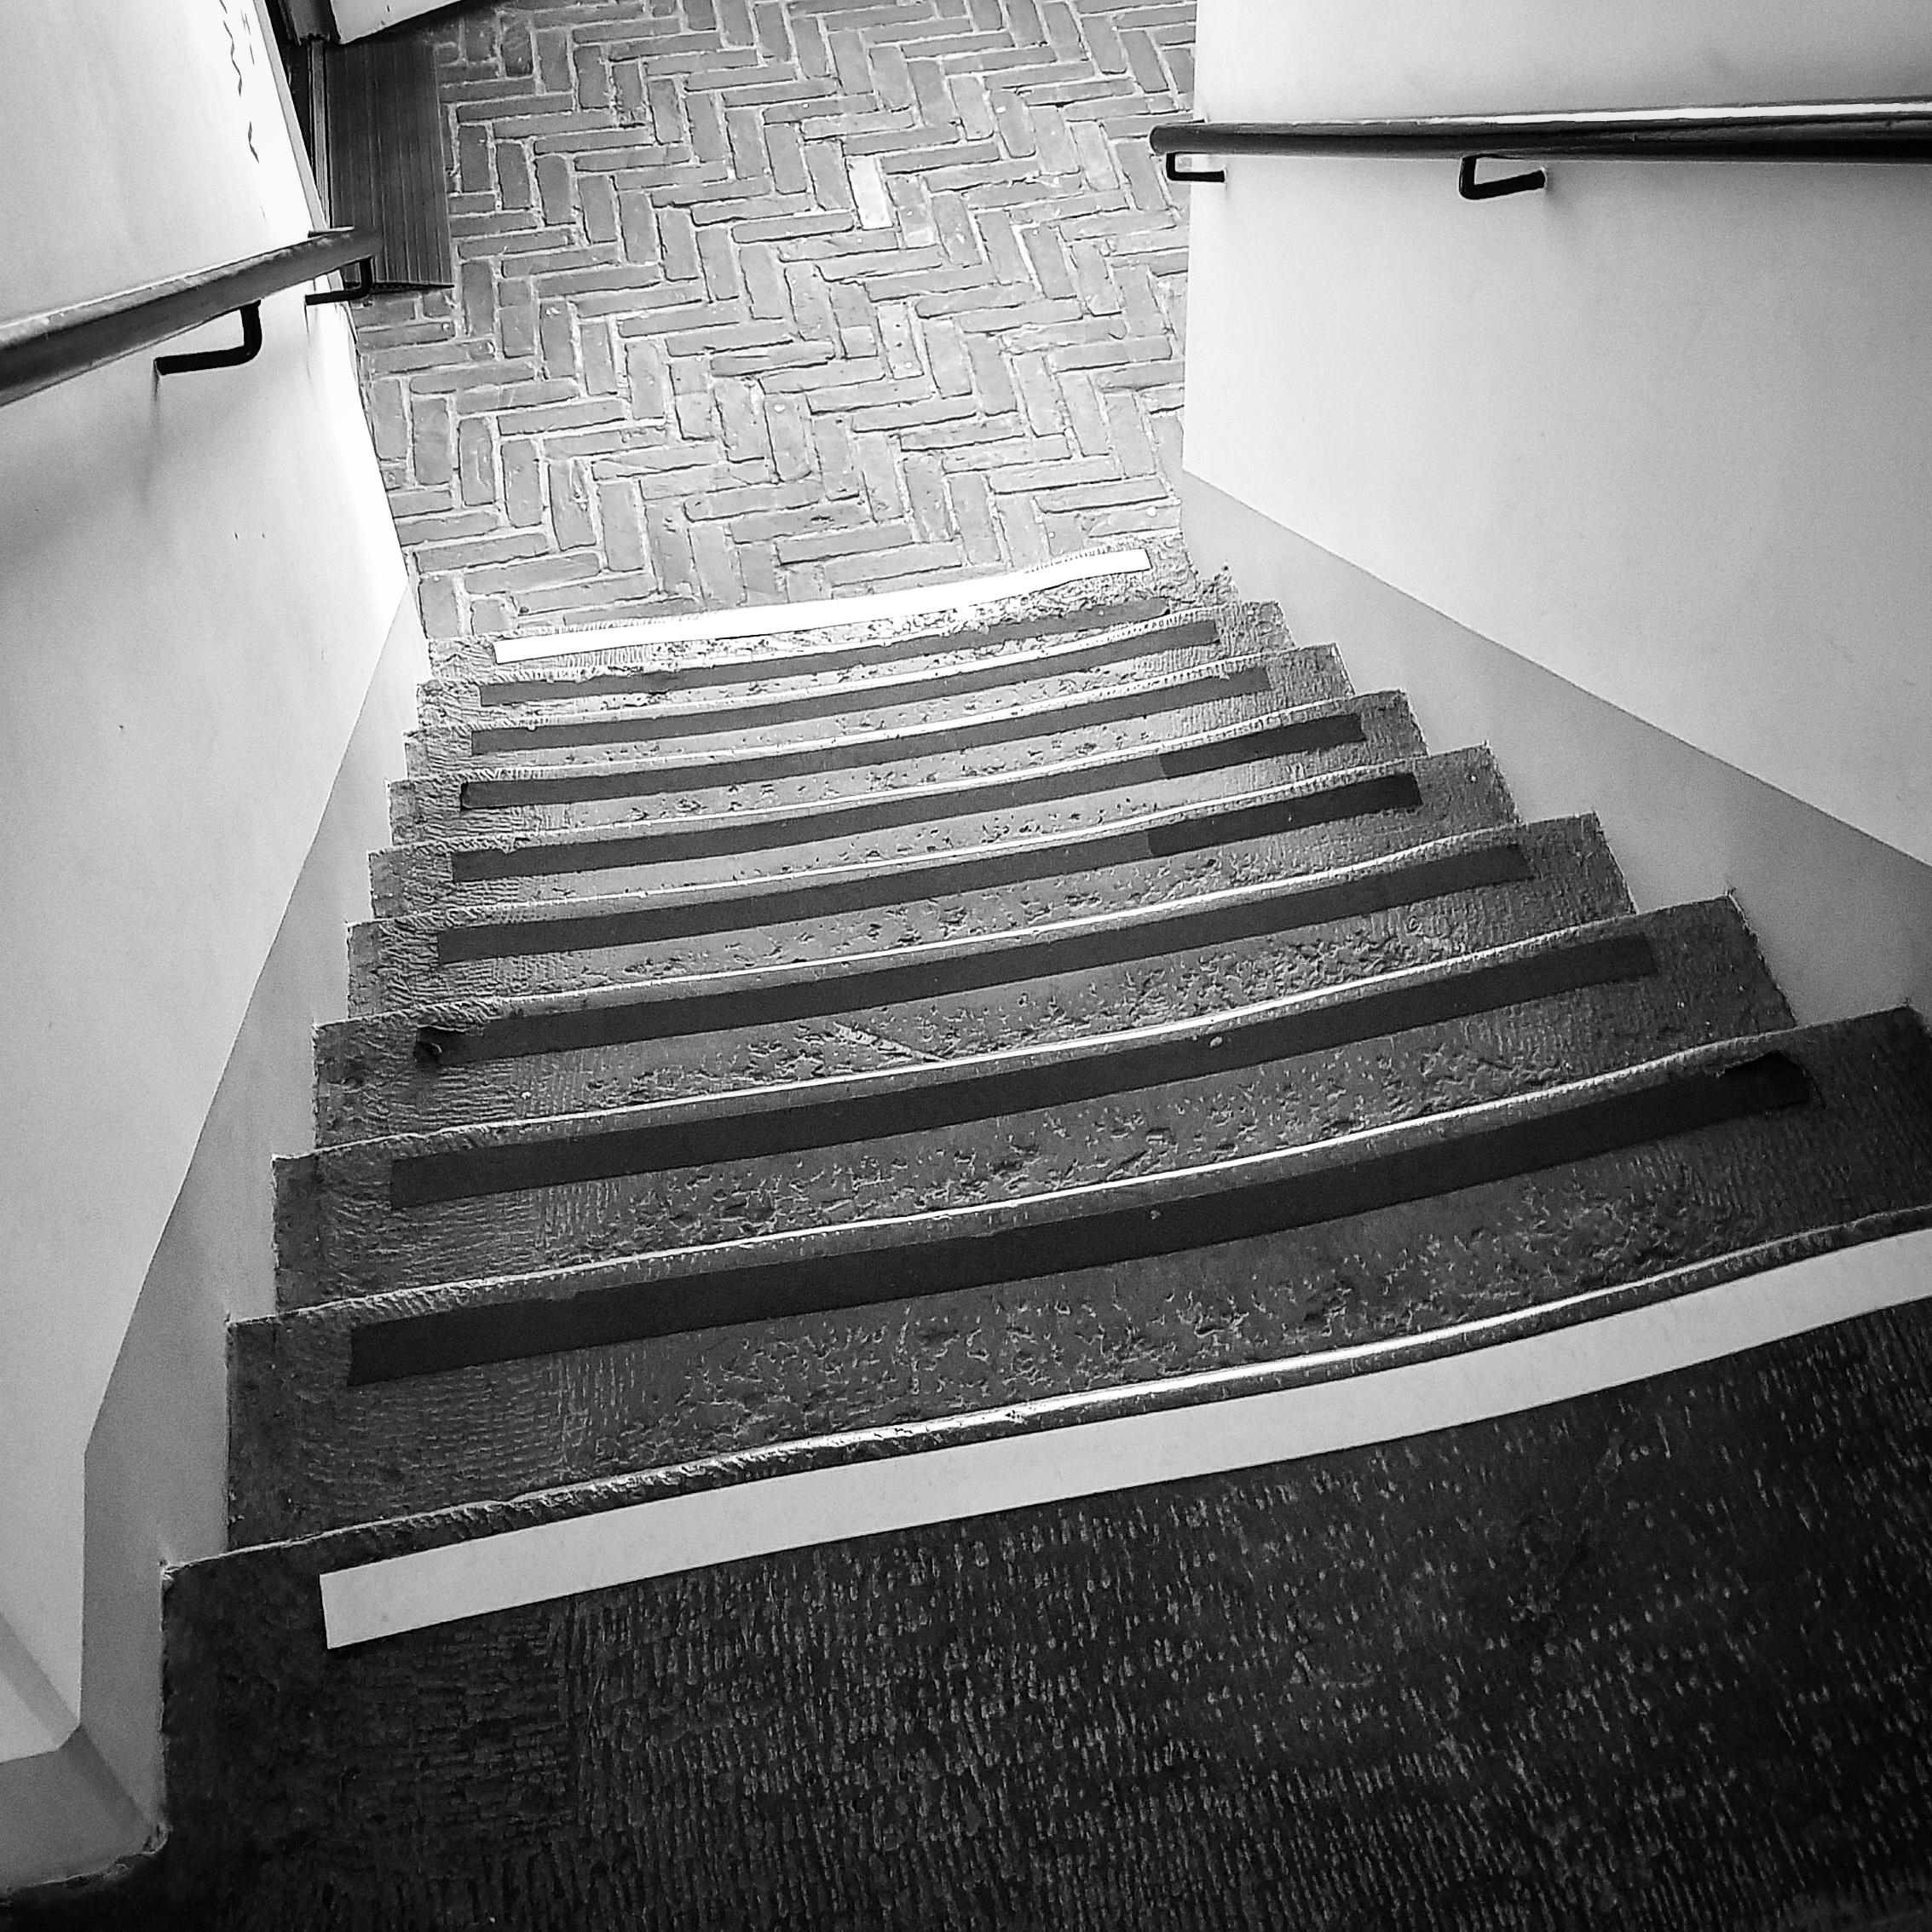 Day 185 - July 04: Worn Steps